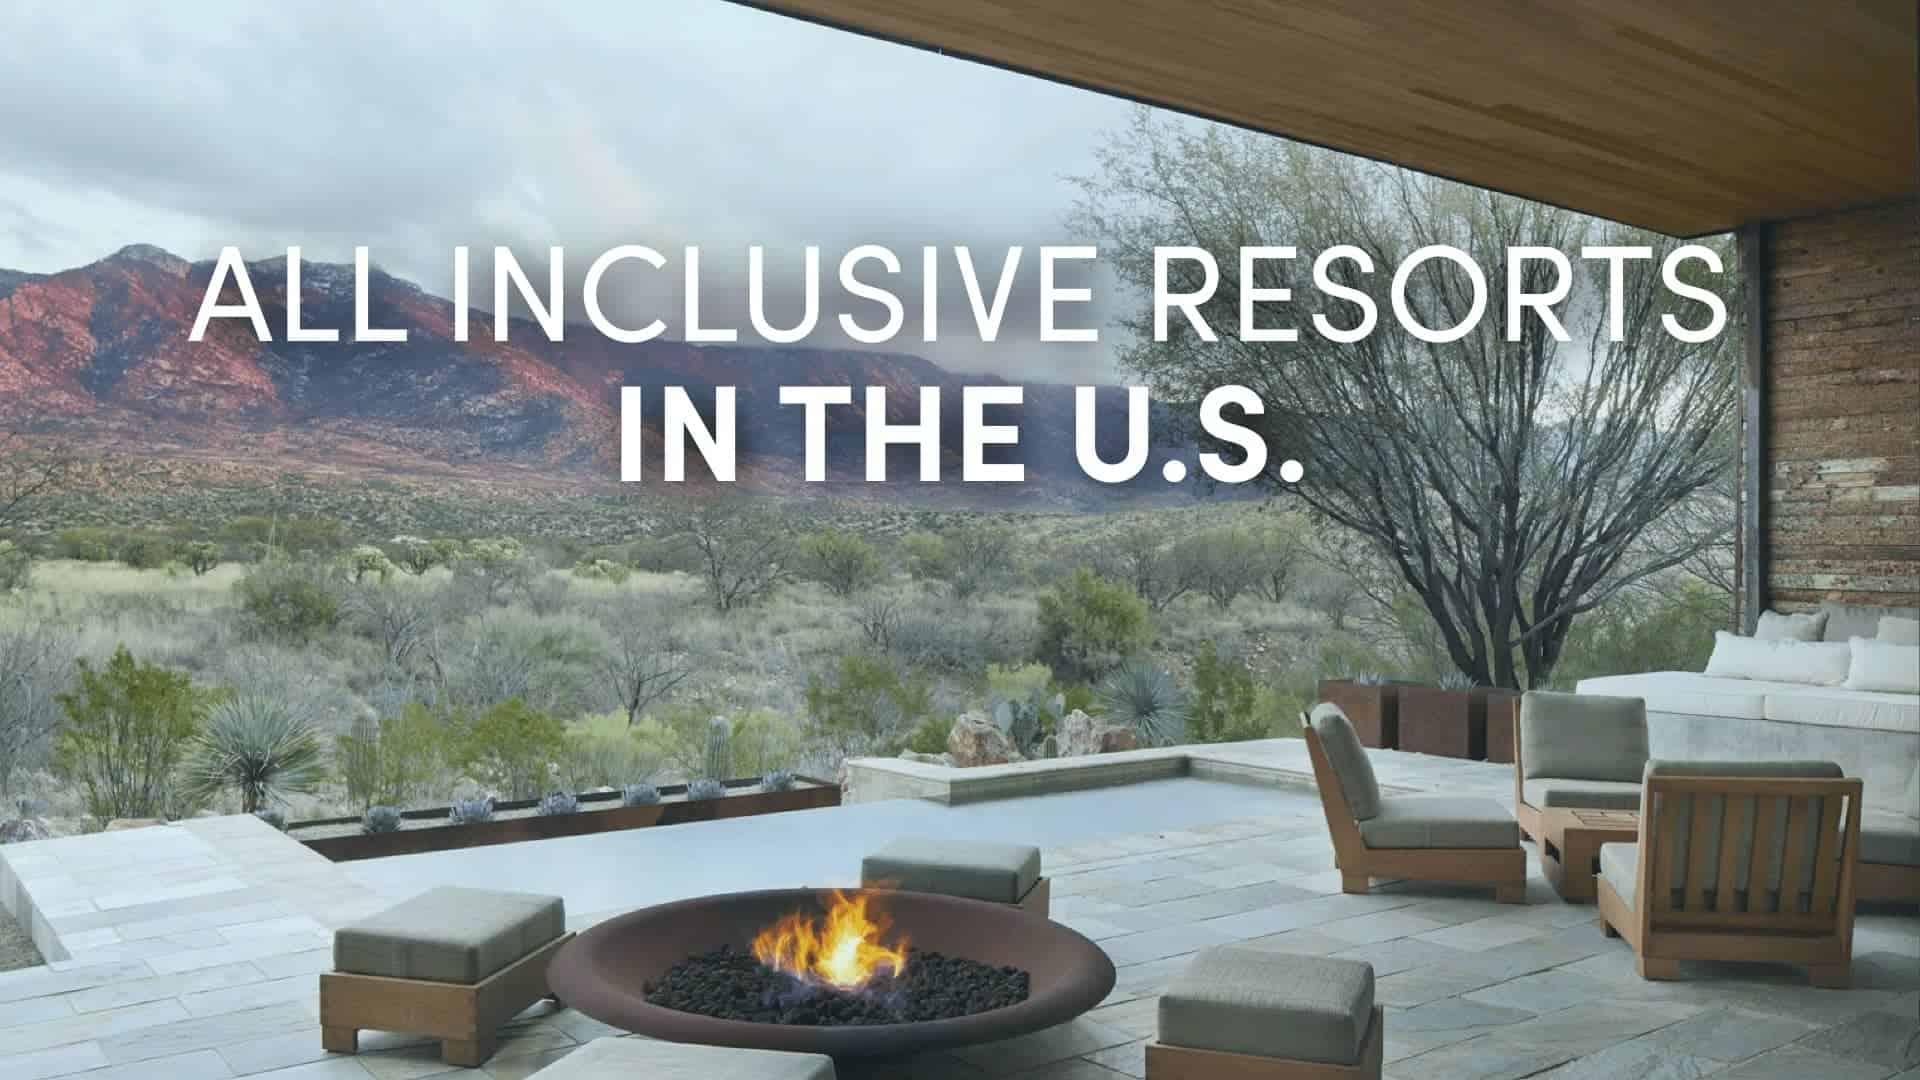 All_inclusive_Resorts_in_the_U.S.